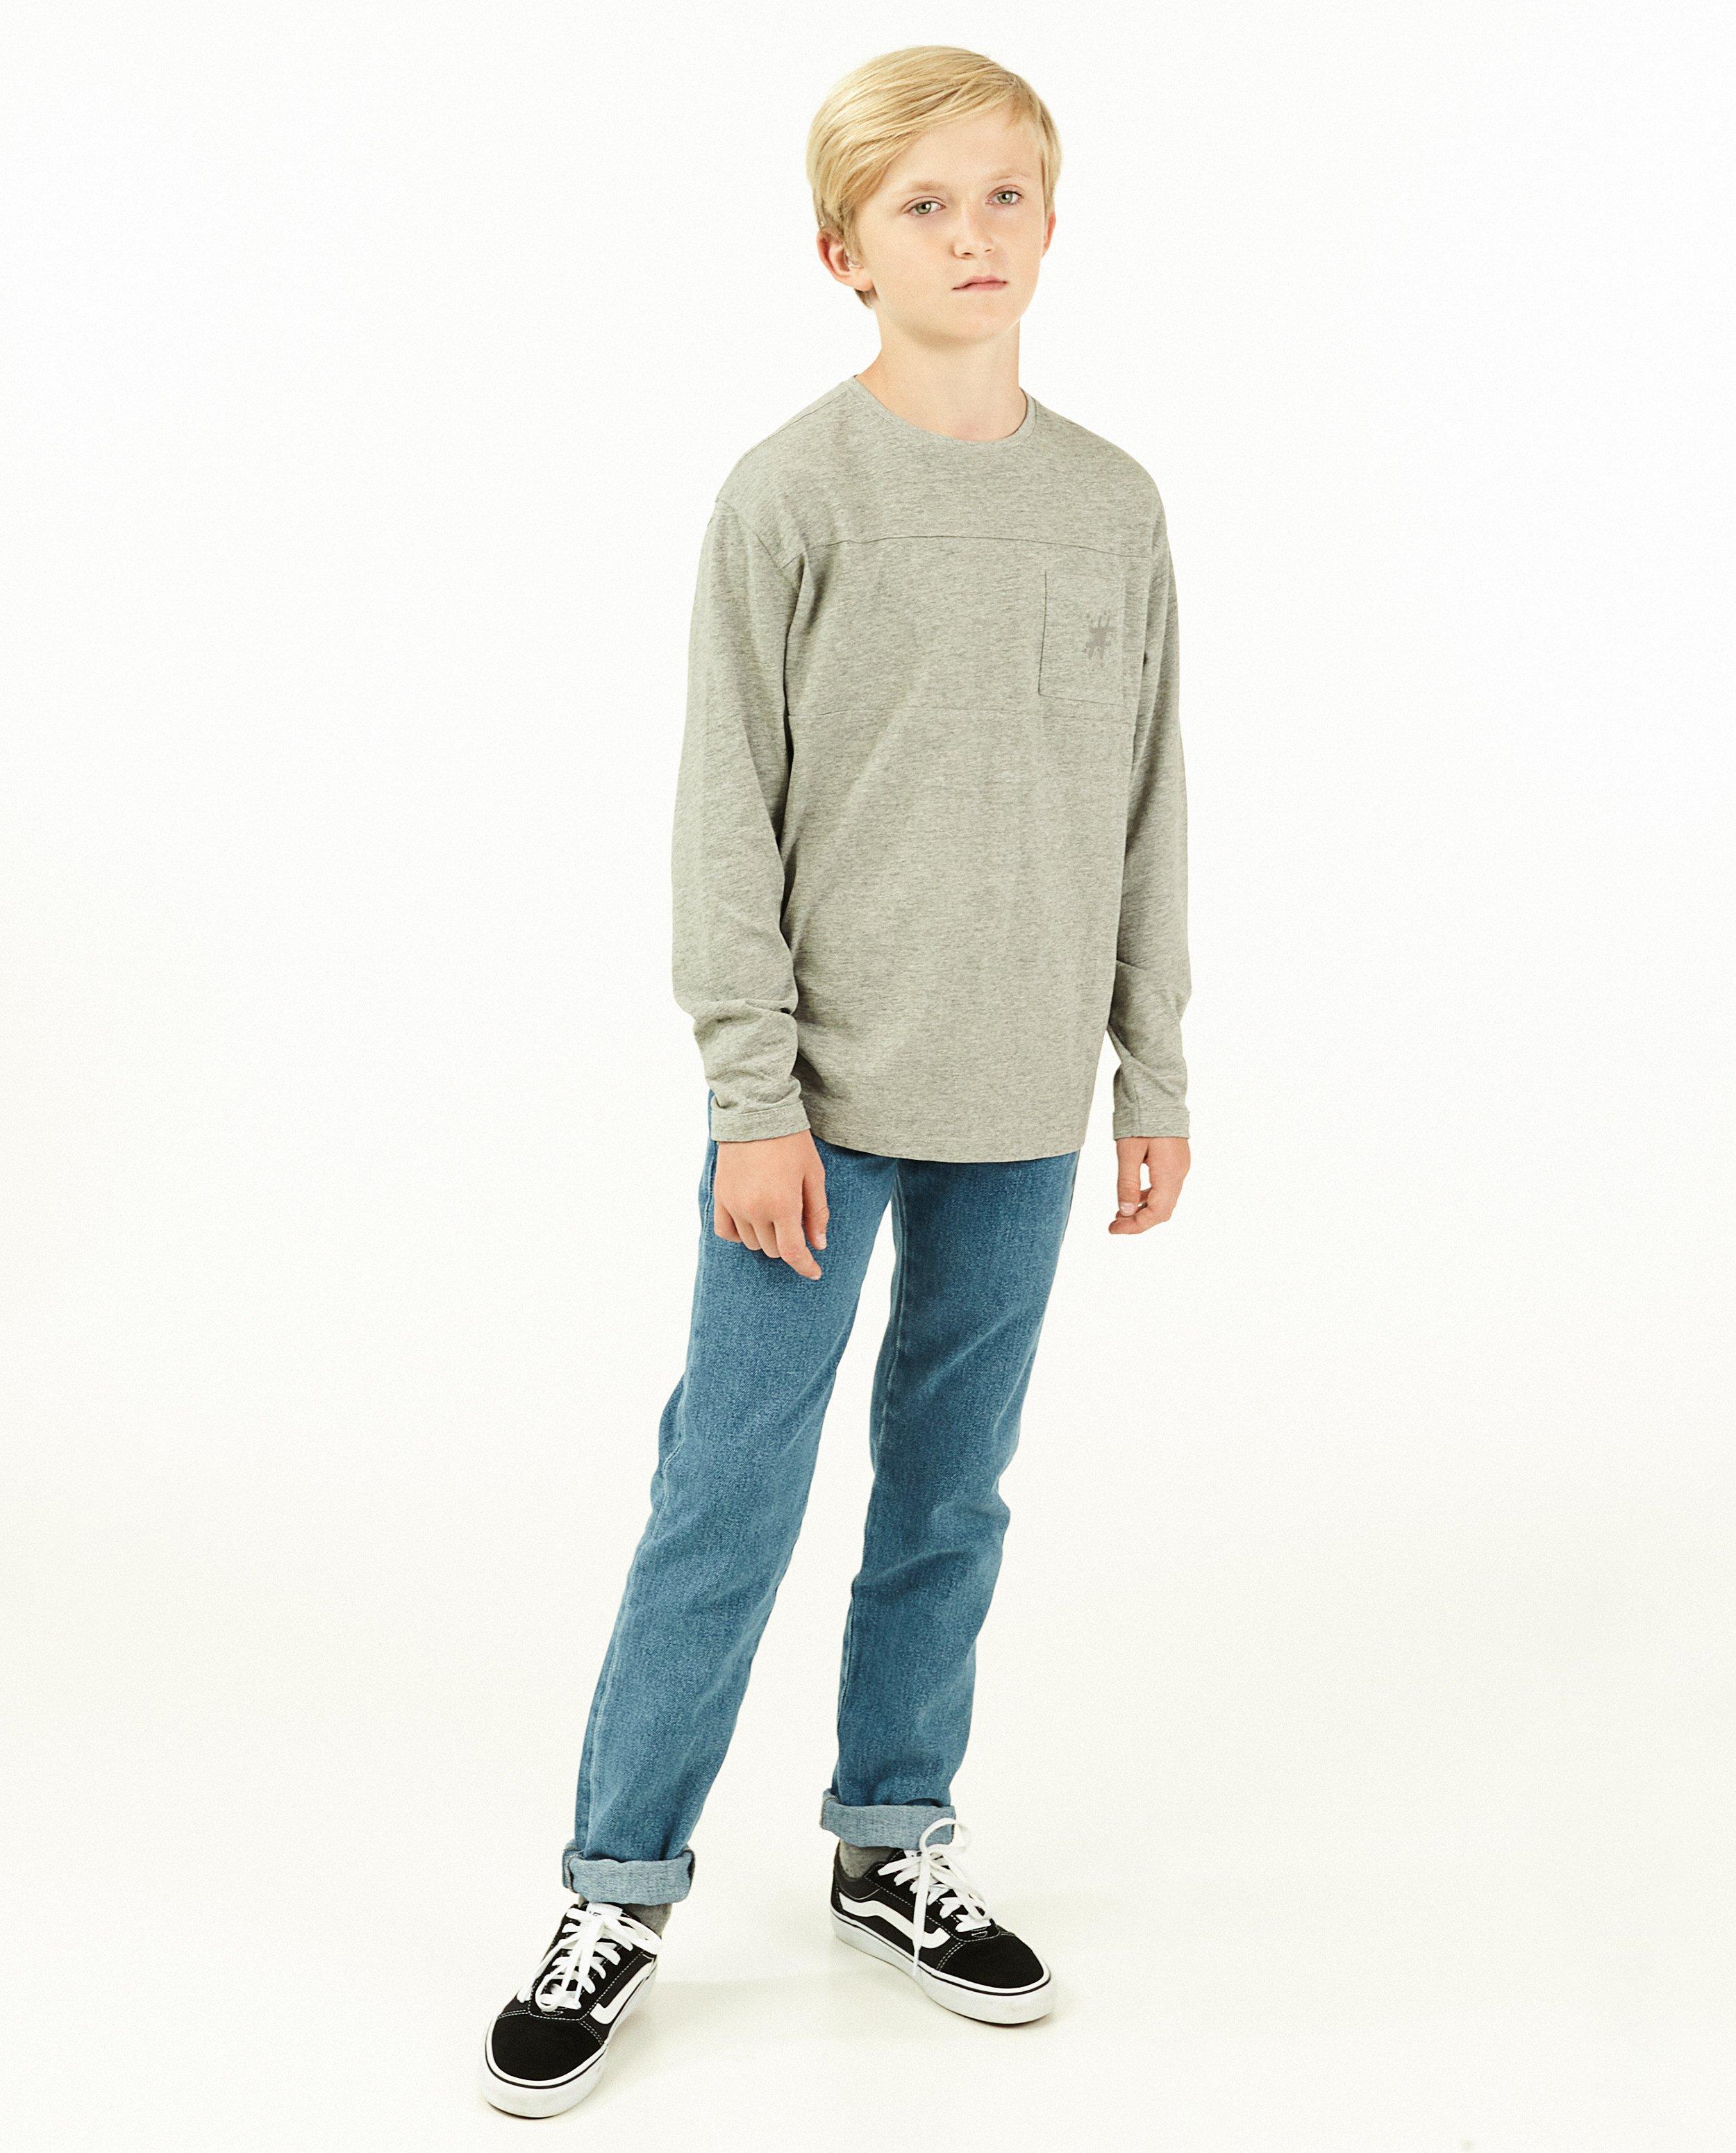 T-shirt gris à manches longues #LikeMe - chiné - Like Me